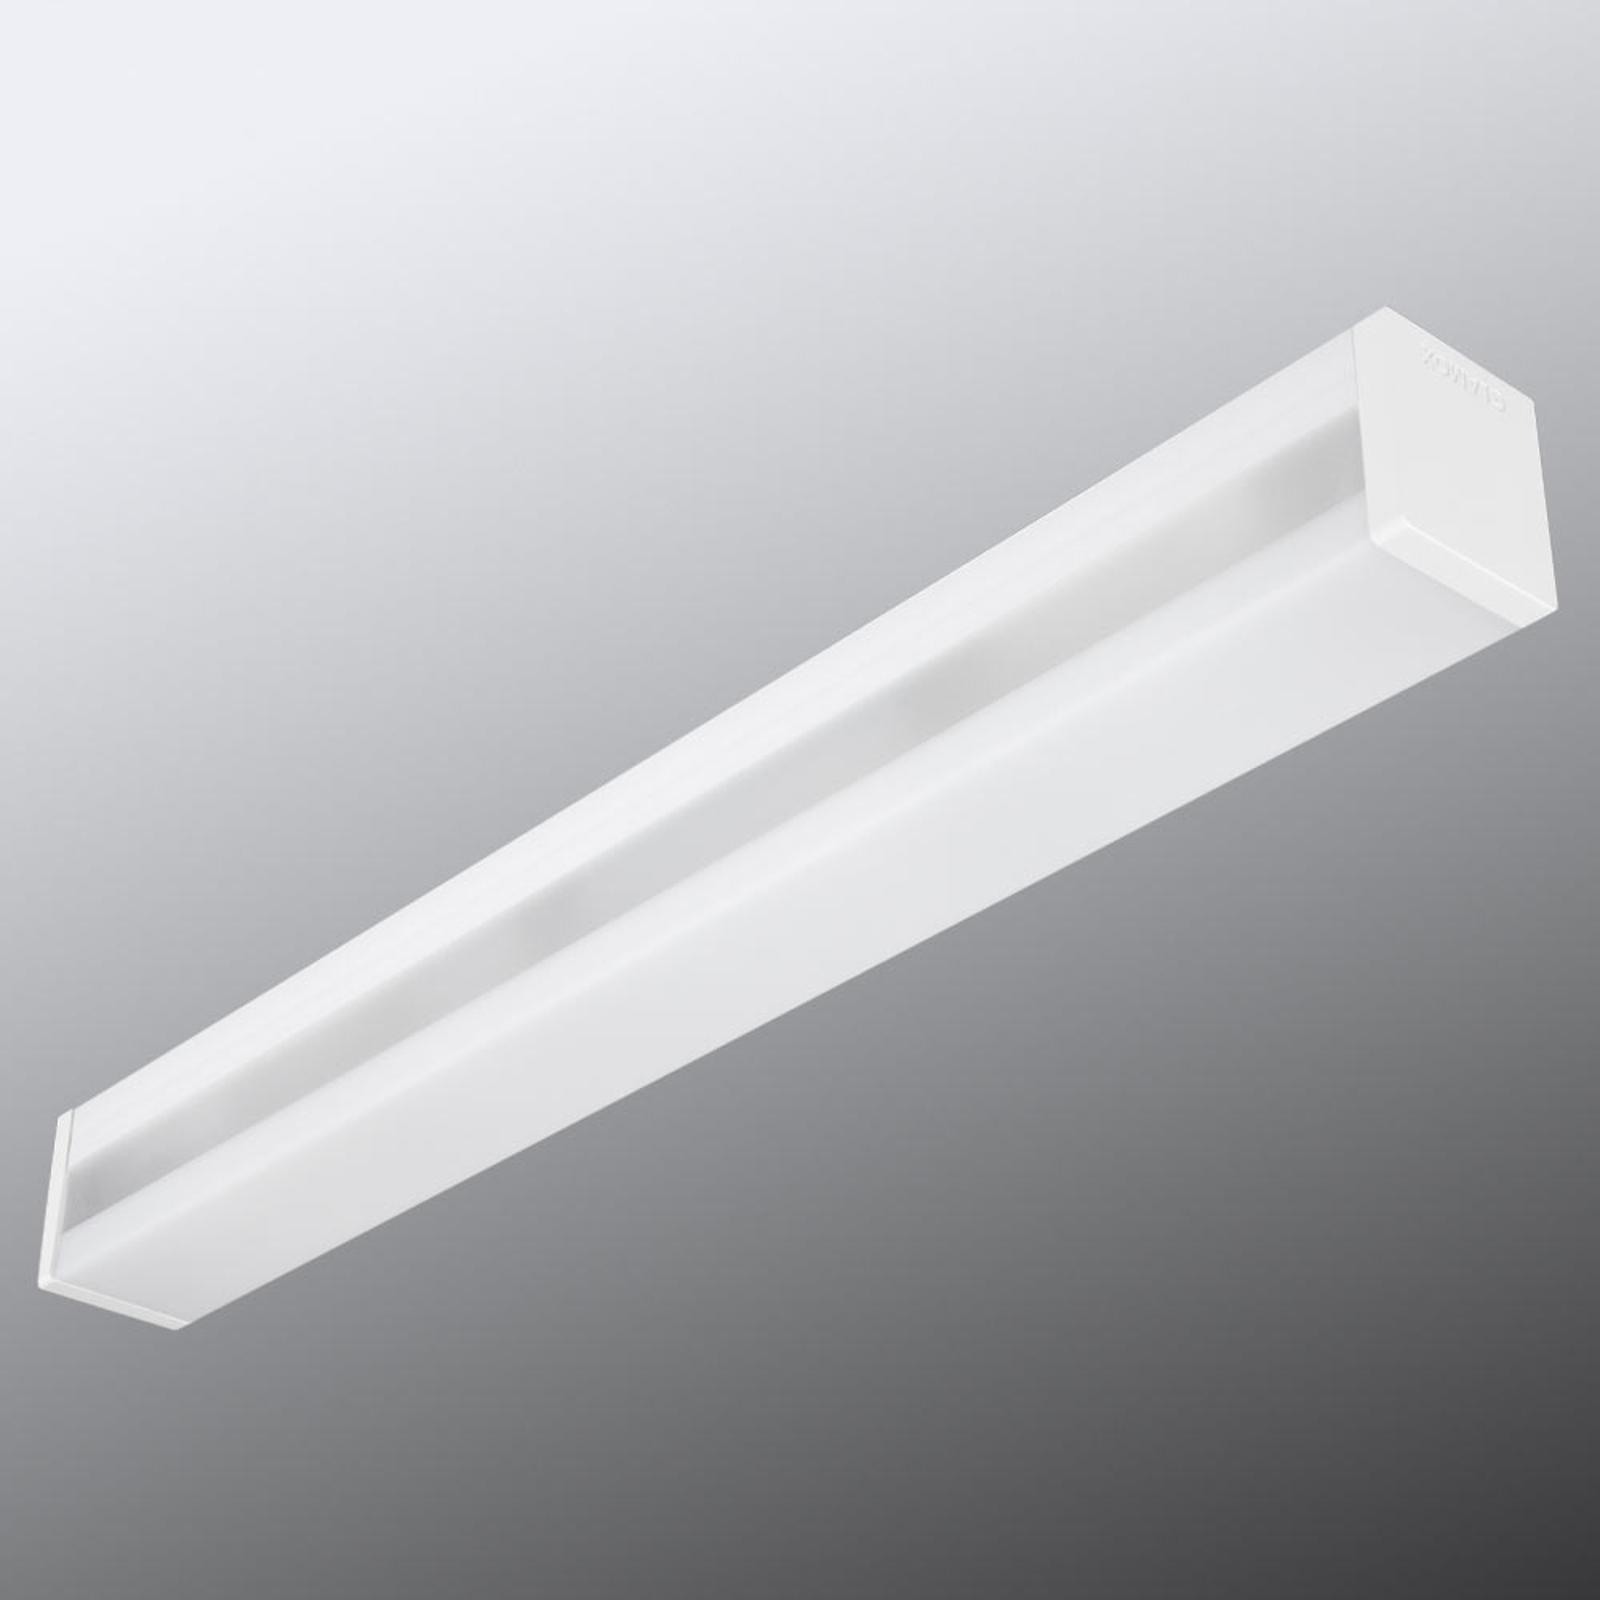 Applique miroir LED A40-W600 1000HF 60cm 9W 3000K